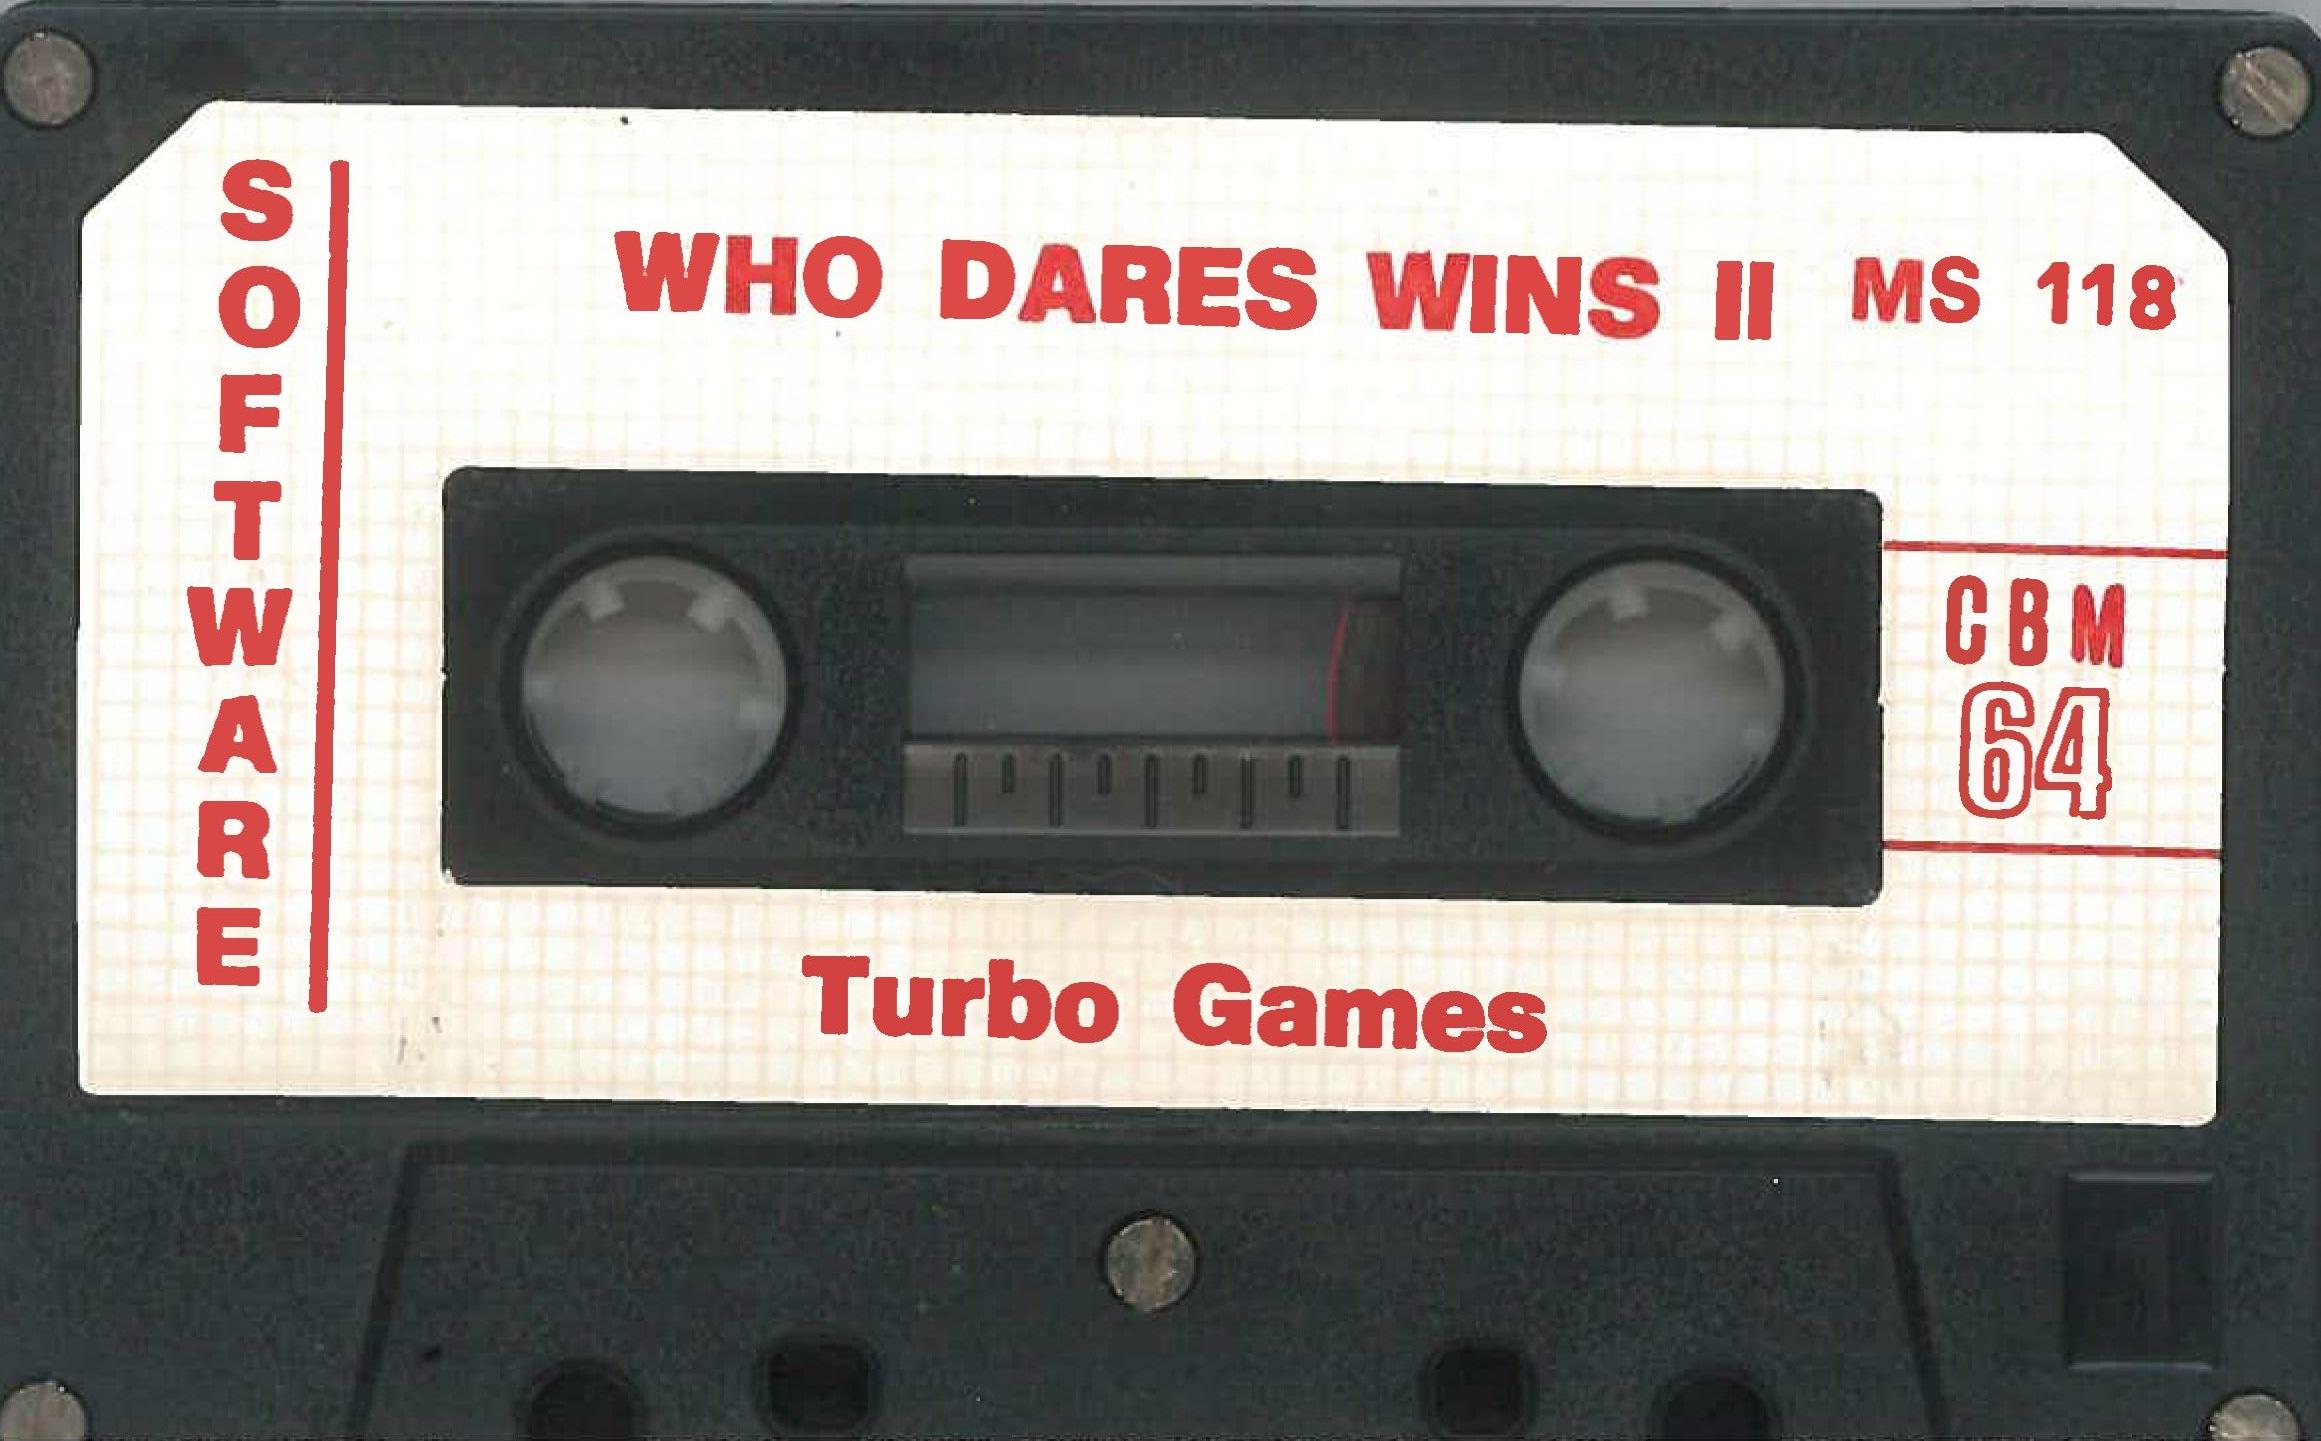 WHO DARES WIN II MS 118